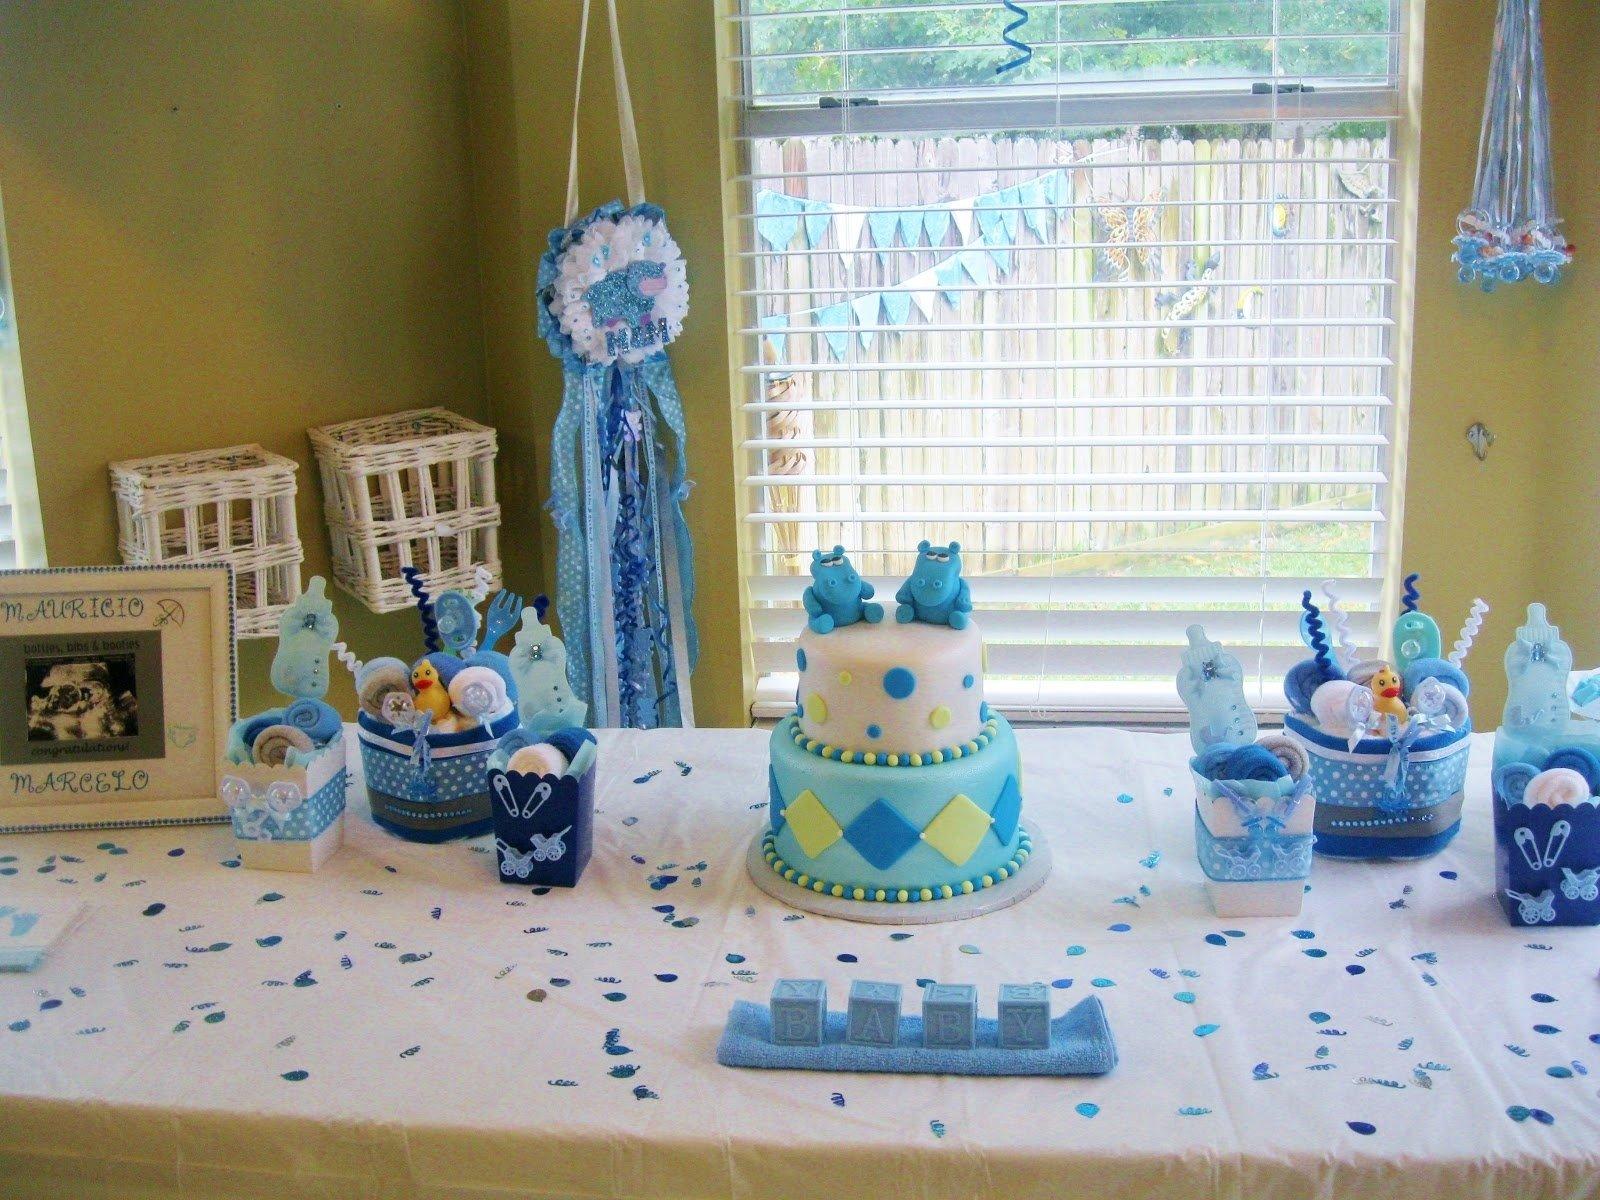 10 Elegant Baby Shower Decoration Ideas For Boys simple baby shower decoration ideas for boy e280a2 baby showers design 2 2020